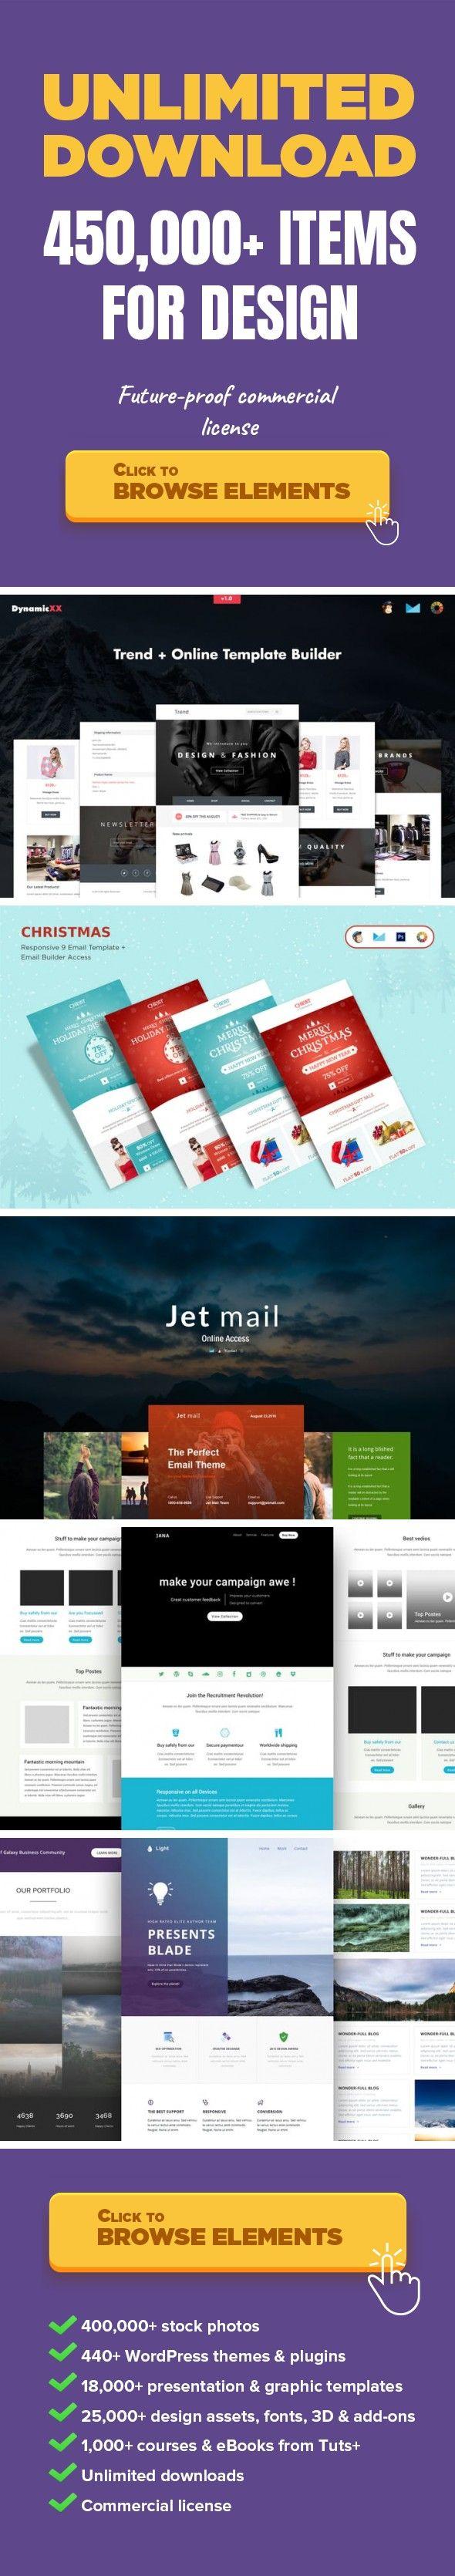 Trend Responsive Fashion Email Online Builder Web Templates - Mailchimp template builder